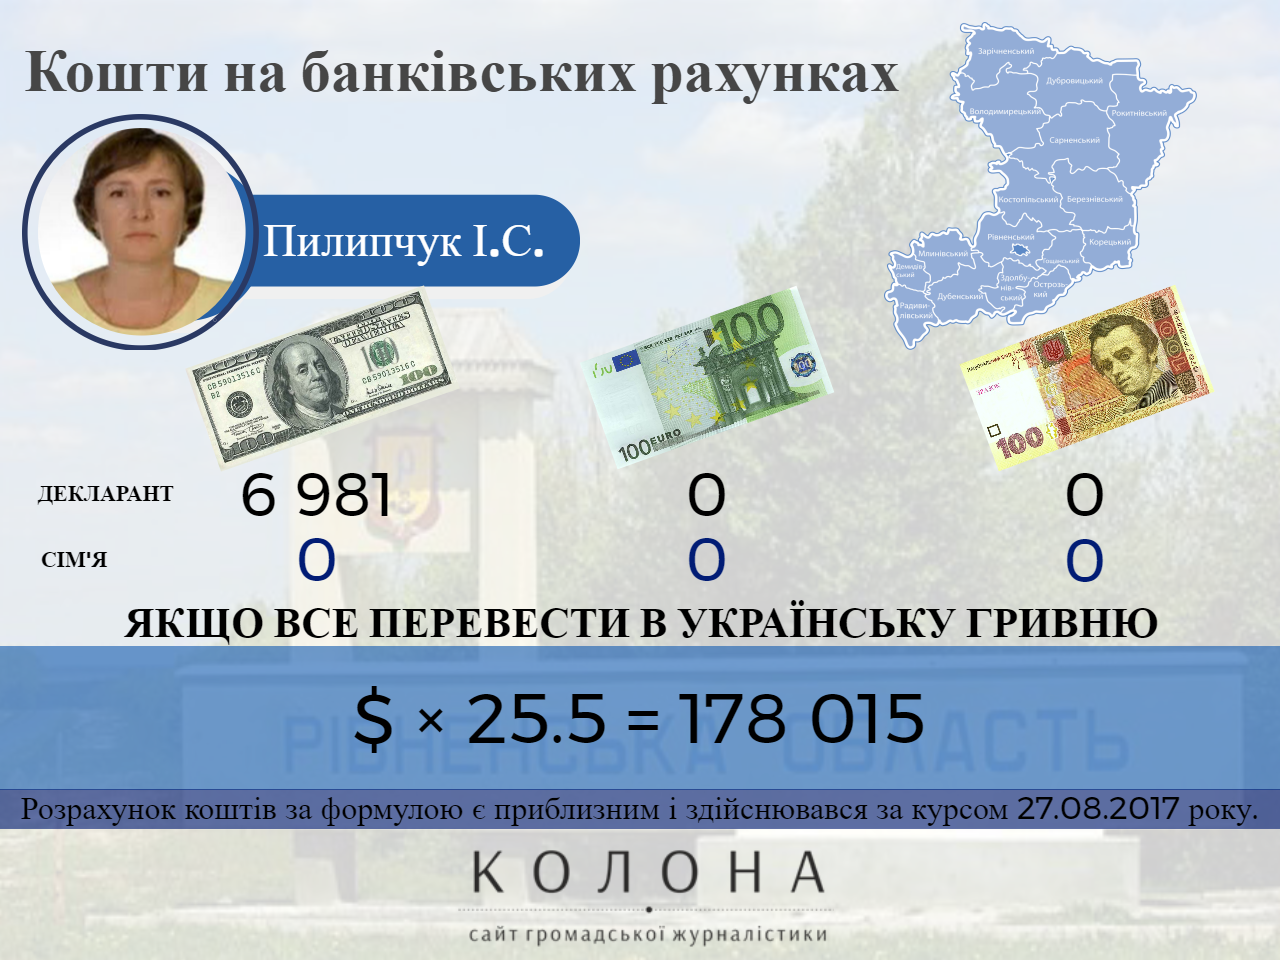 Пилипчук Ірина Стахівна